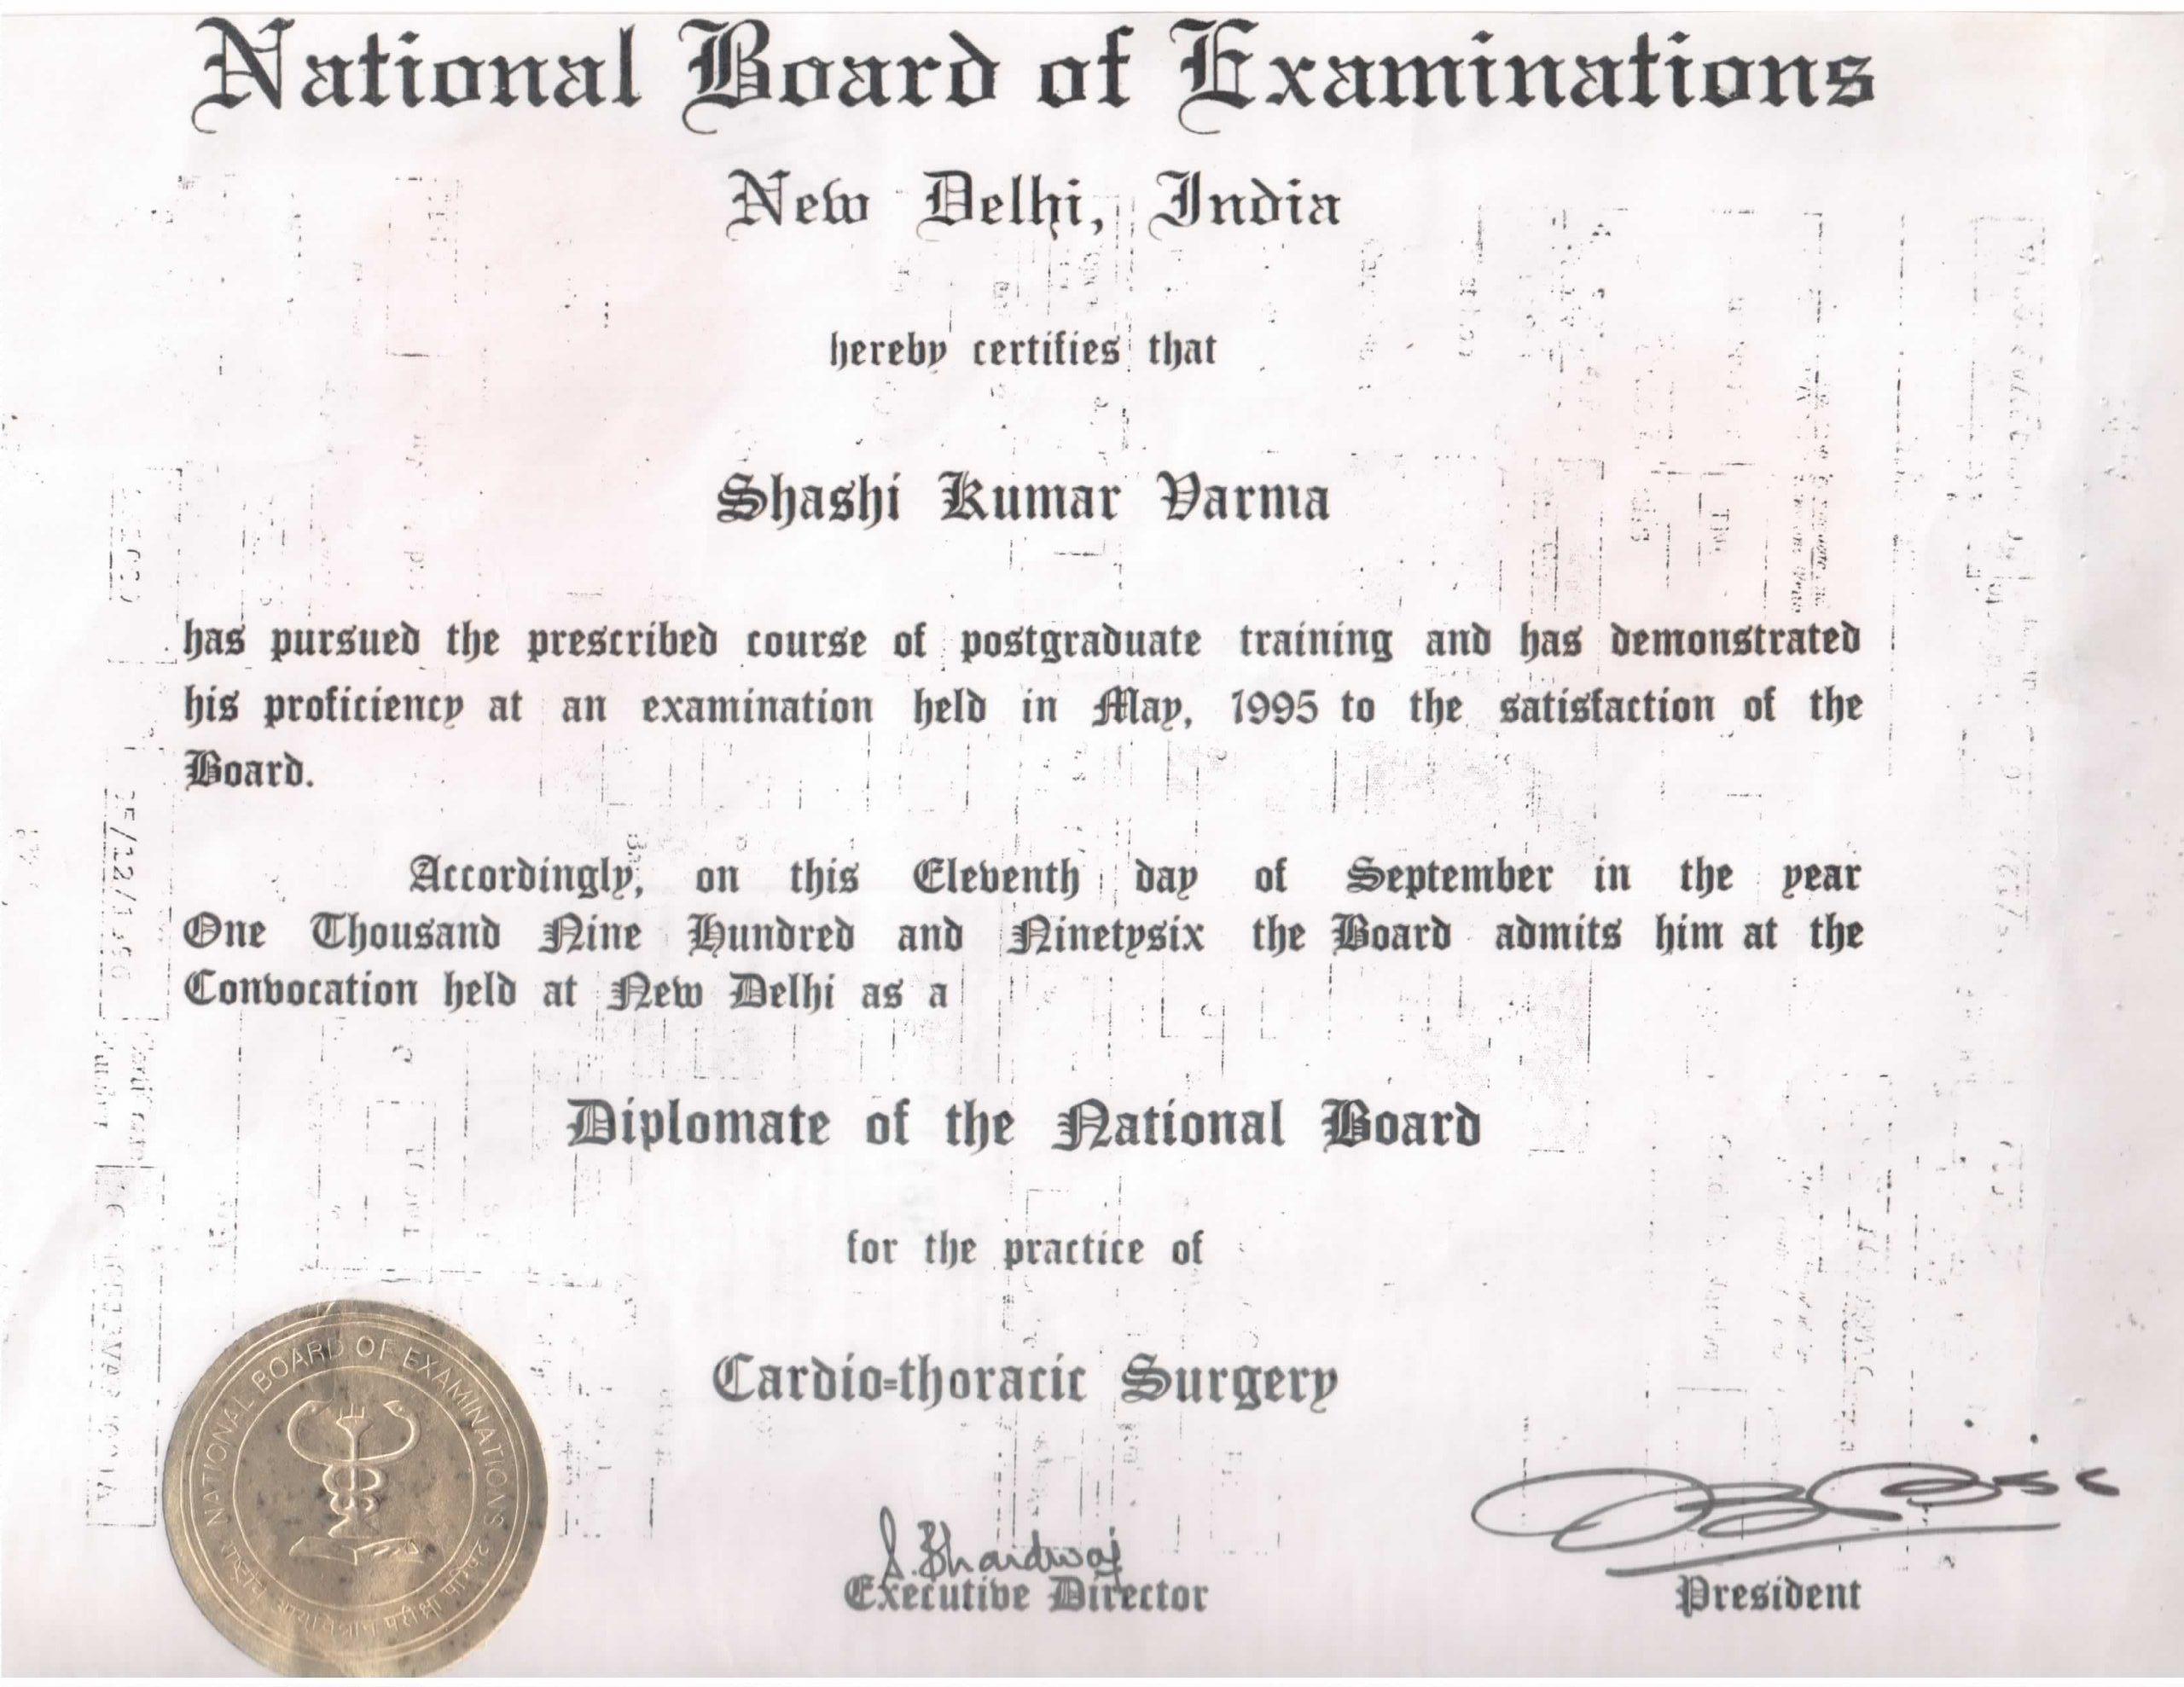 SK Varma (DNB Certificate)